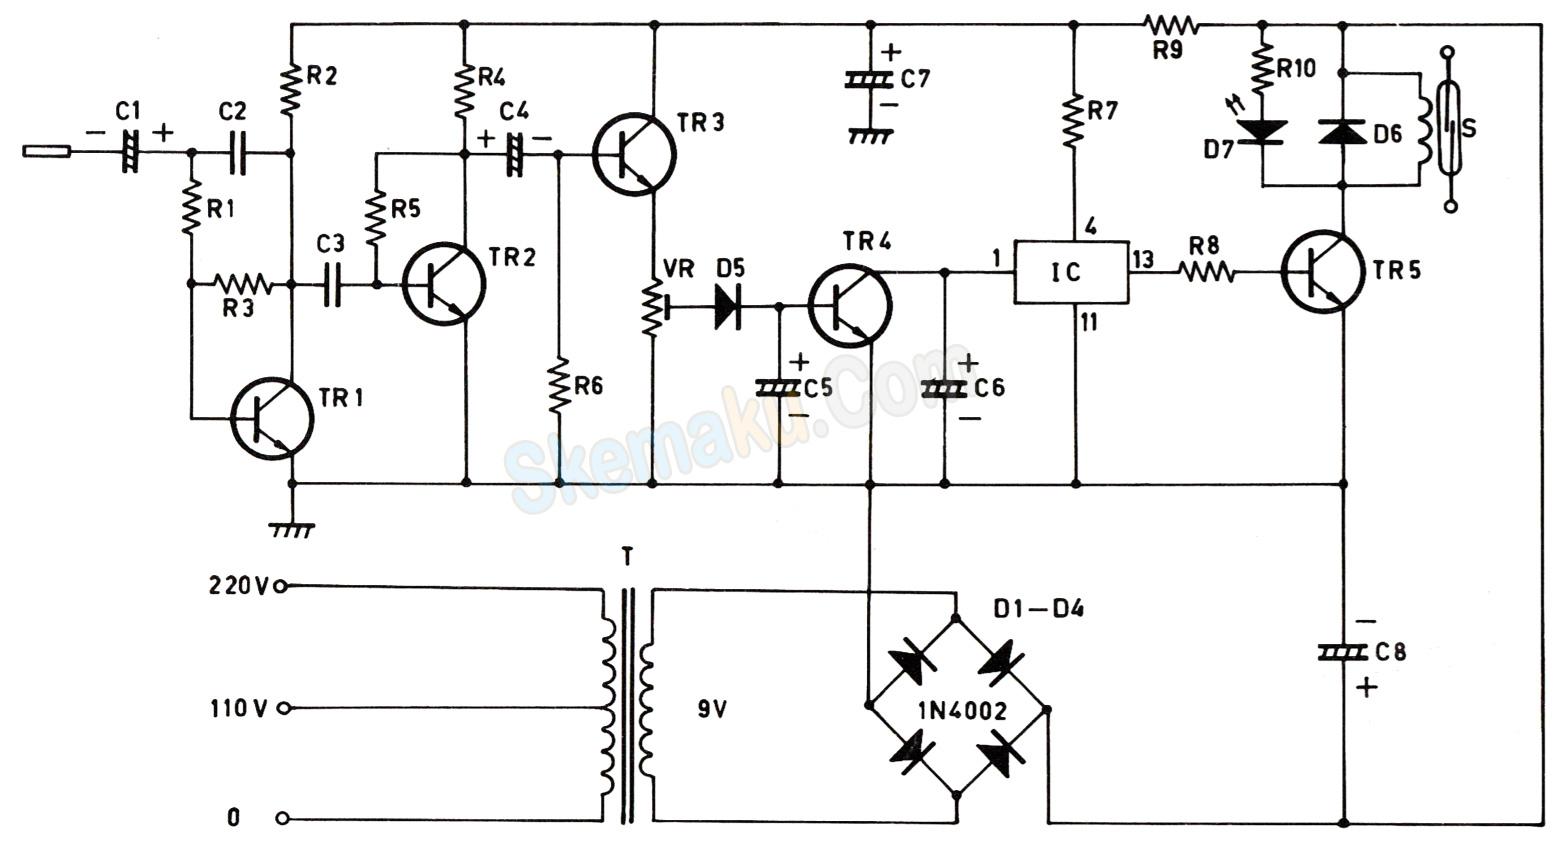 rangkaian saklar sentuh elektronik